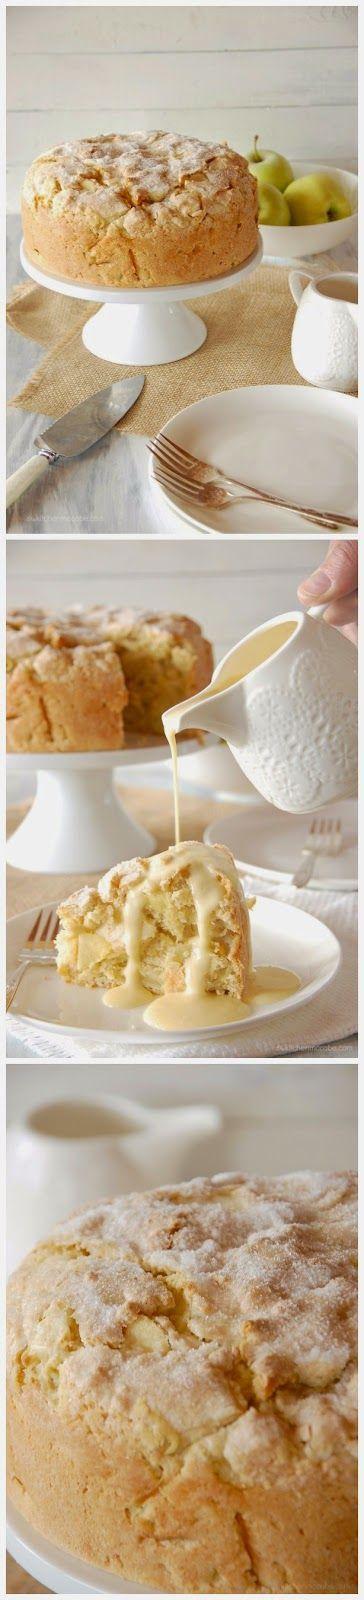 Irish Apple Cake with Custard Sauce